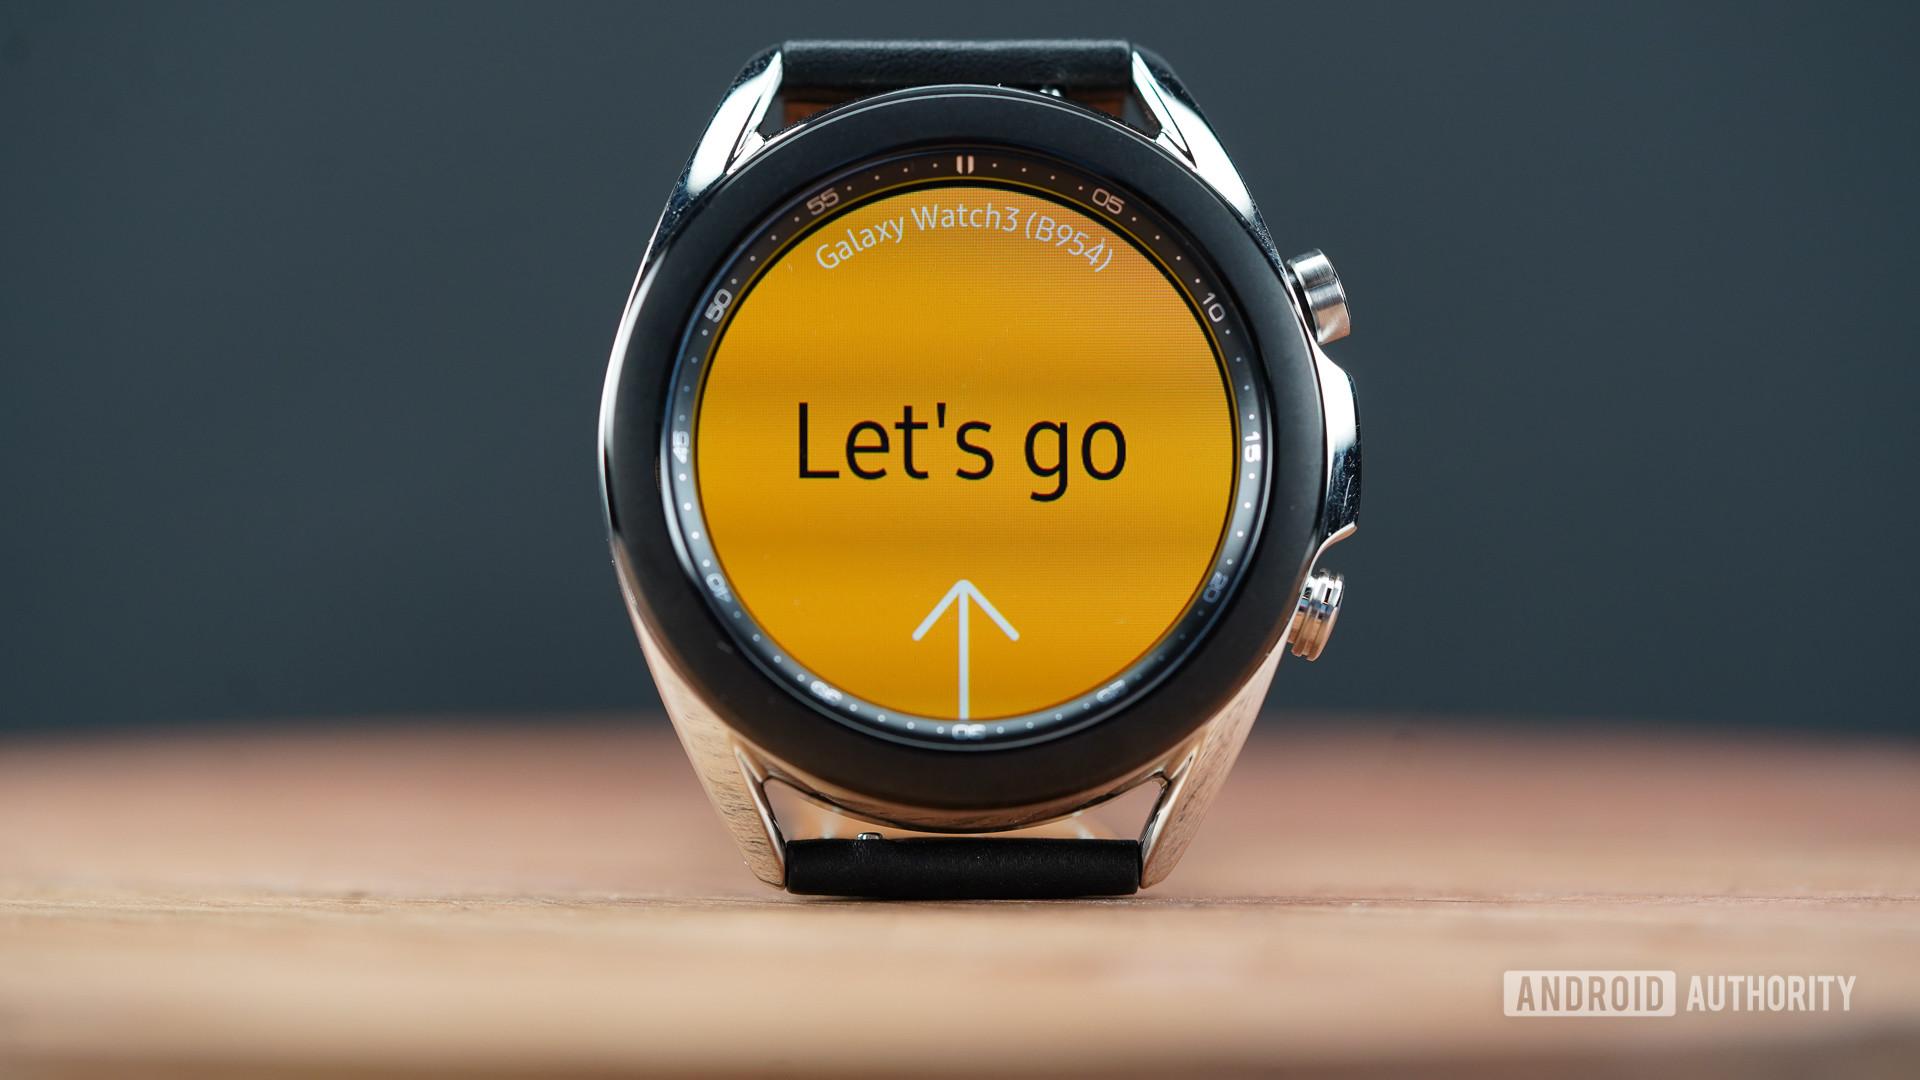 Samsung Galaxy Watch 3 display